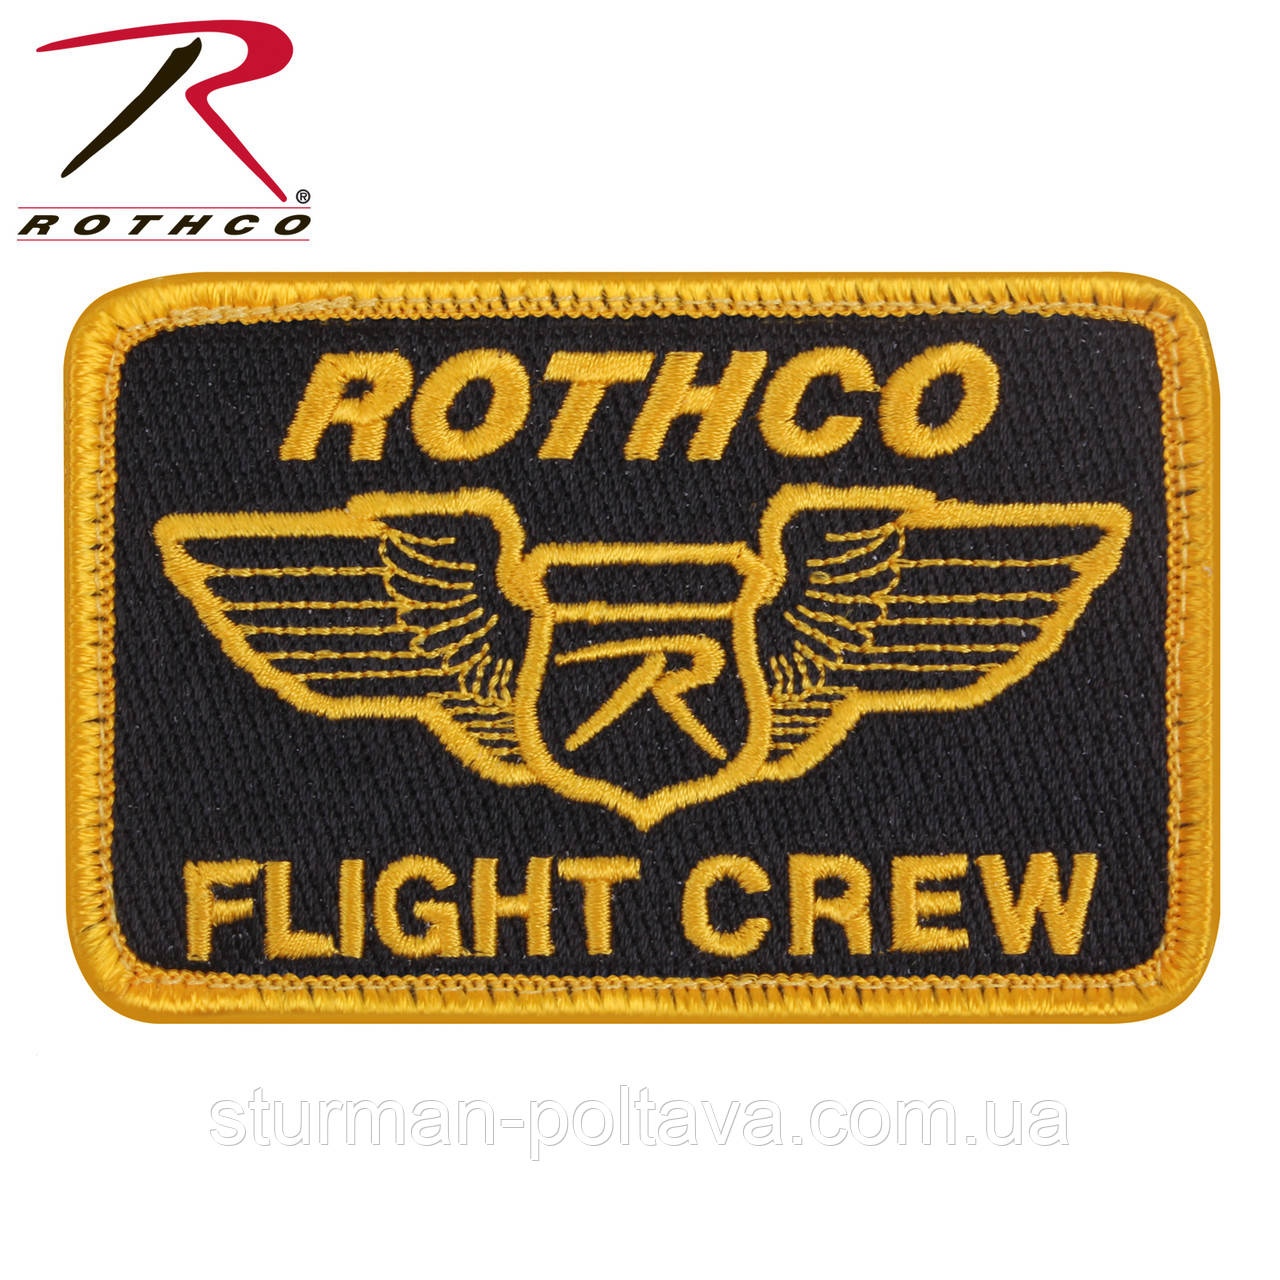 Патч Rothco Morale Velcro Color Patch Rothco Flight Crew